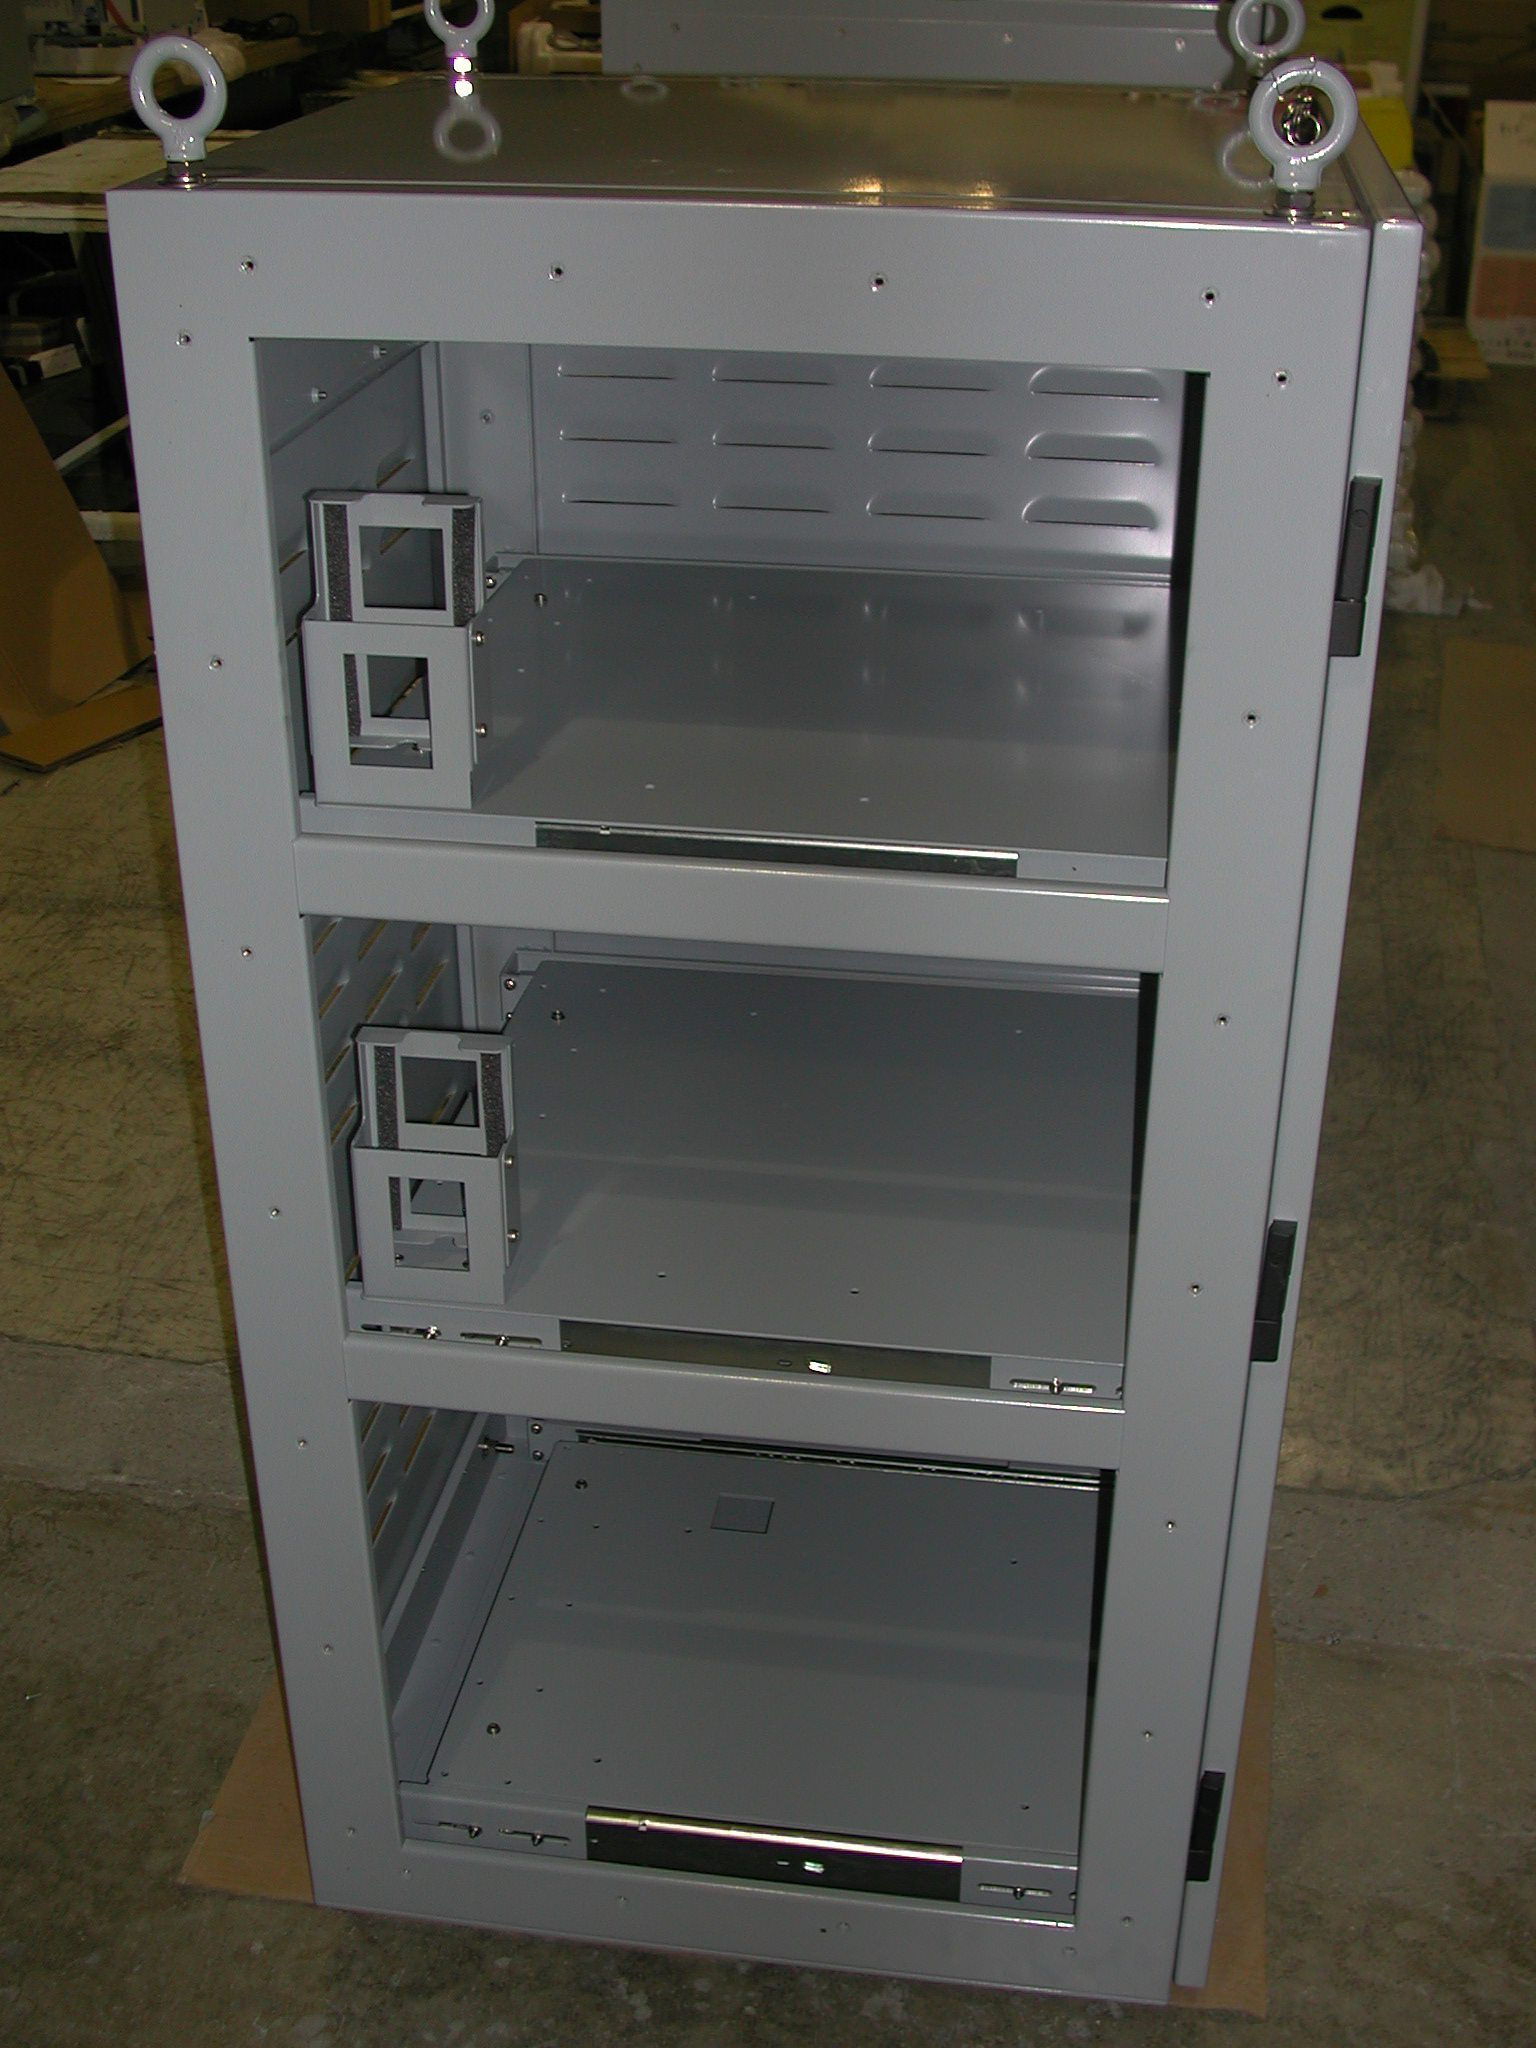 Metal Enclosures Millitary Hopewell Precision NY DSCN1639.JPG